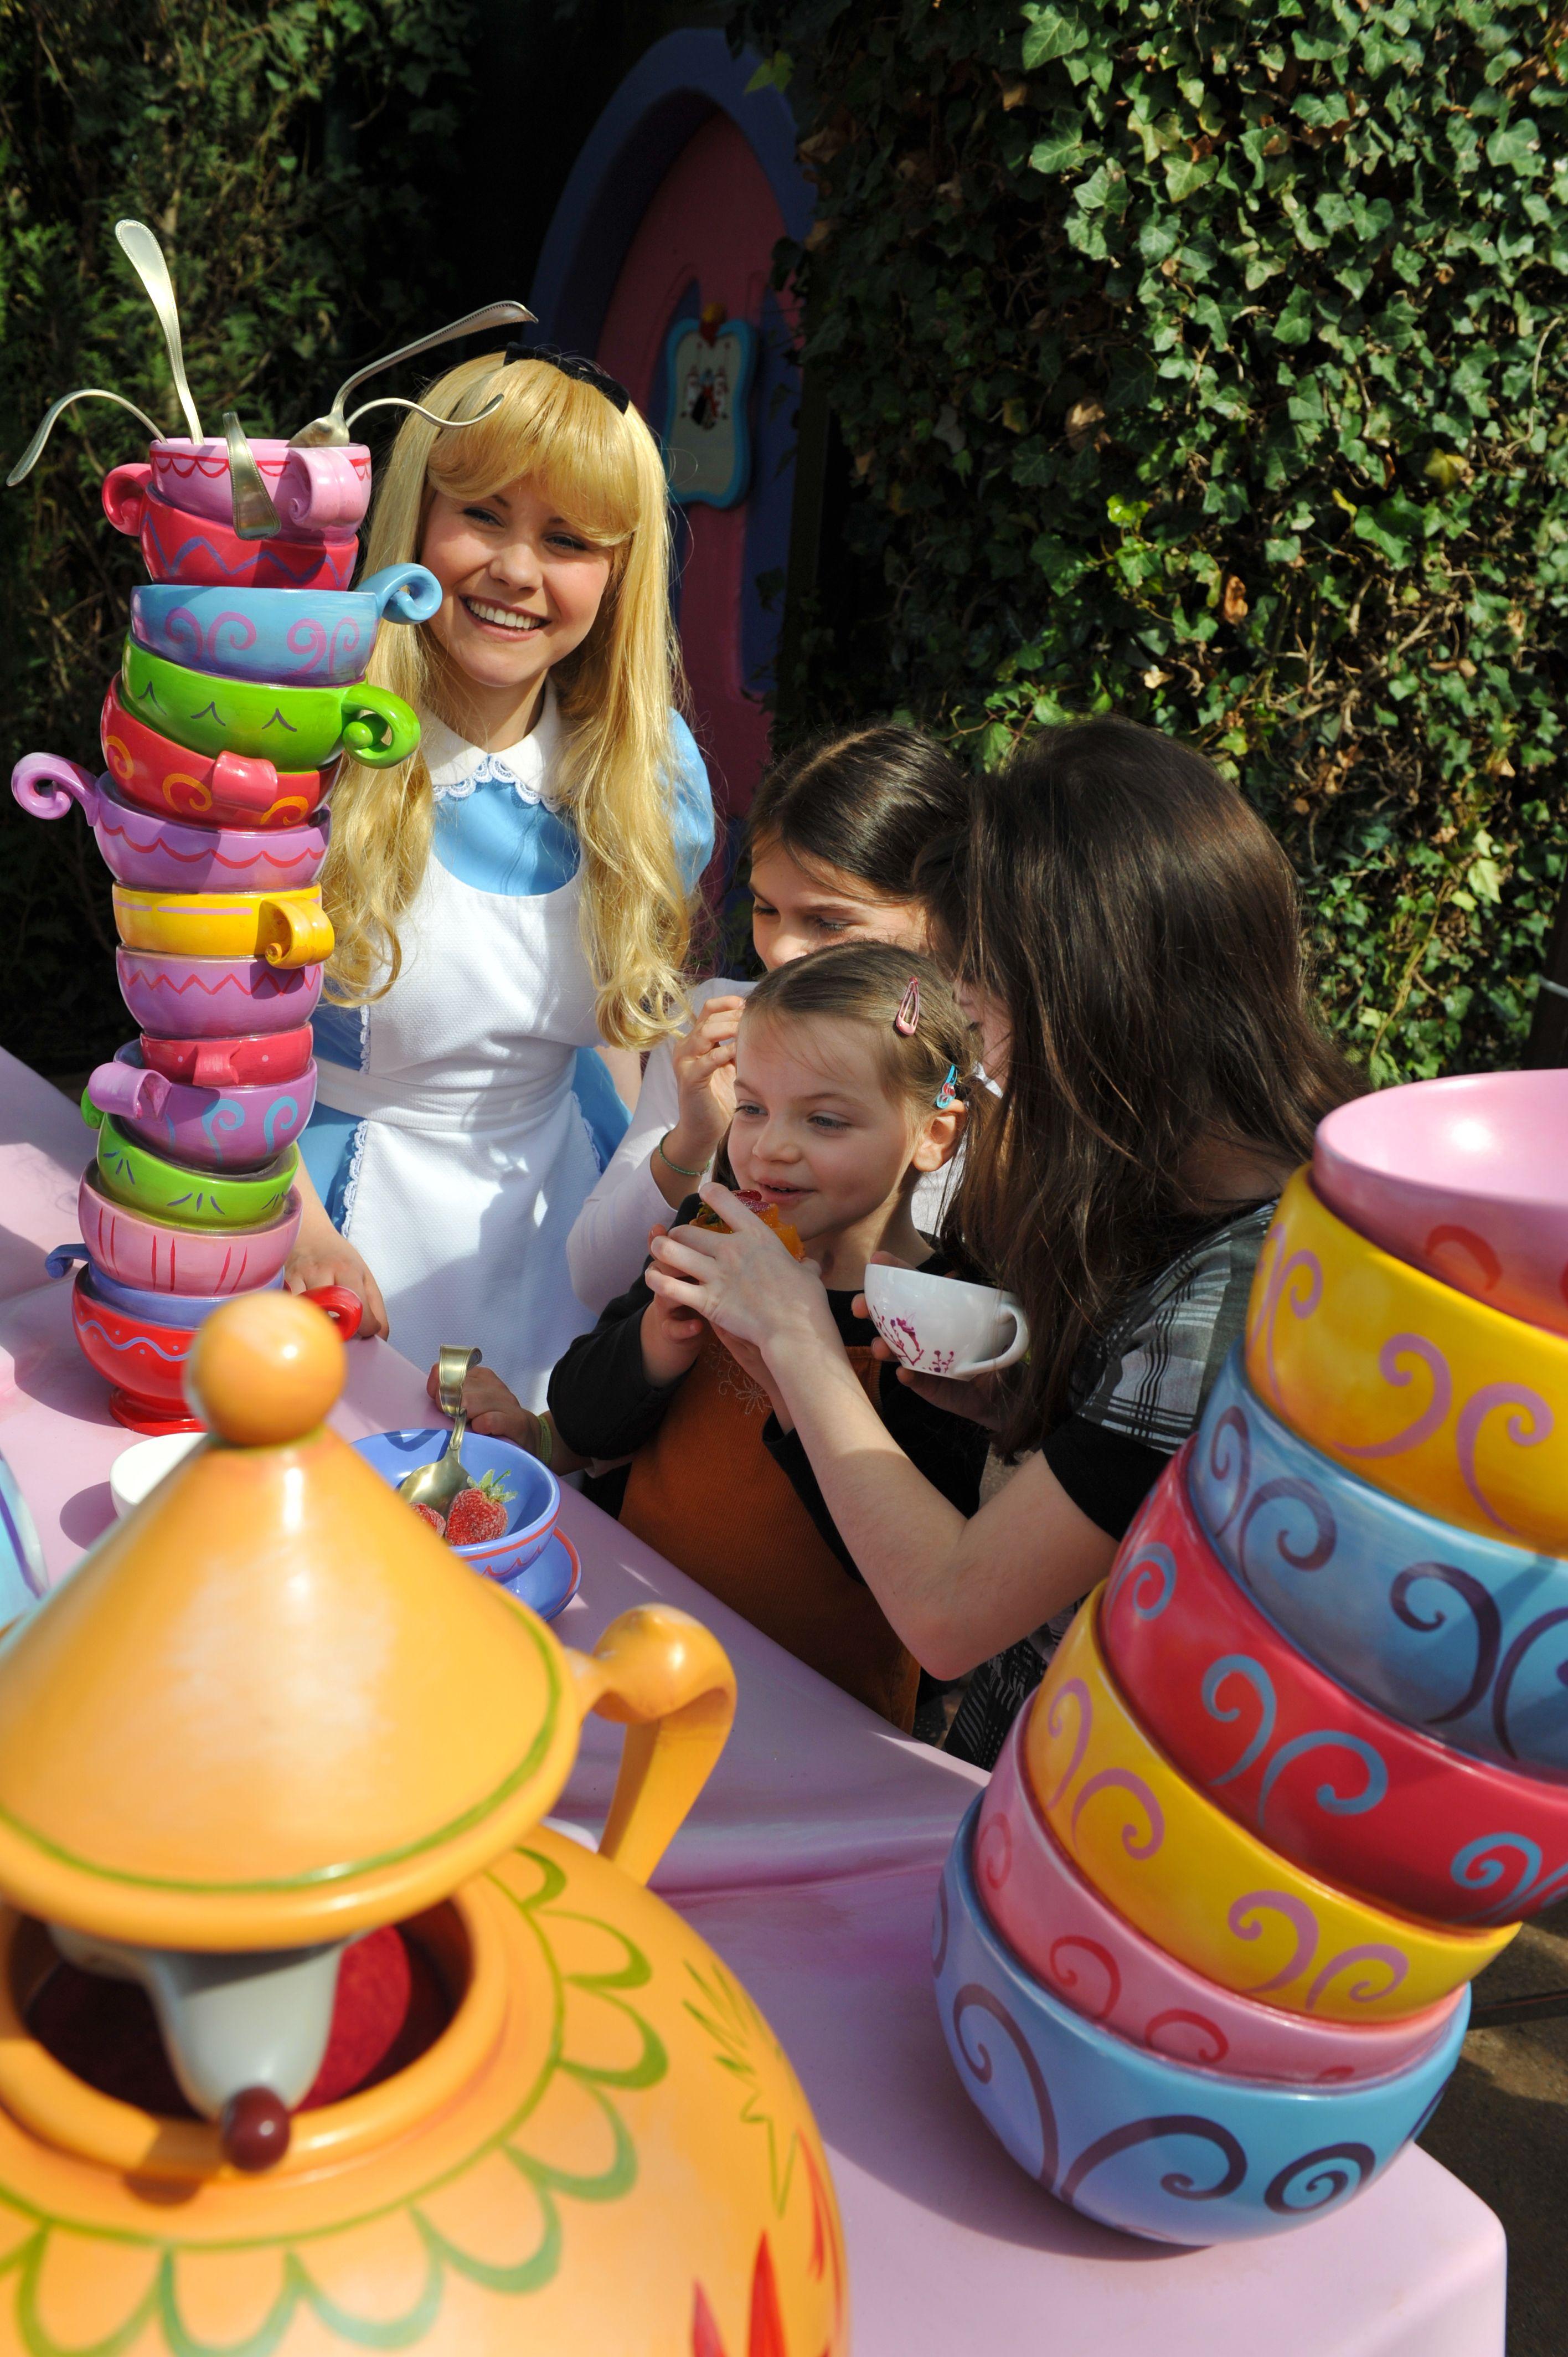 Forced to wear dresses at disneyland stories - Disneyland Park Fantasyland Alice In Wonderland With Girl Disneyland Paris